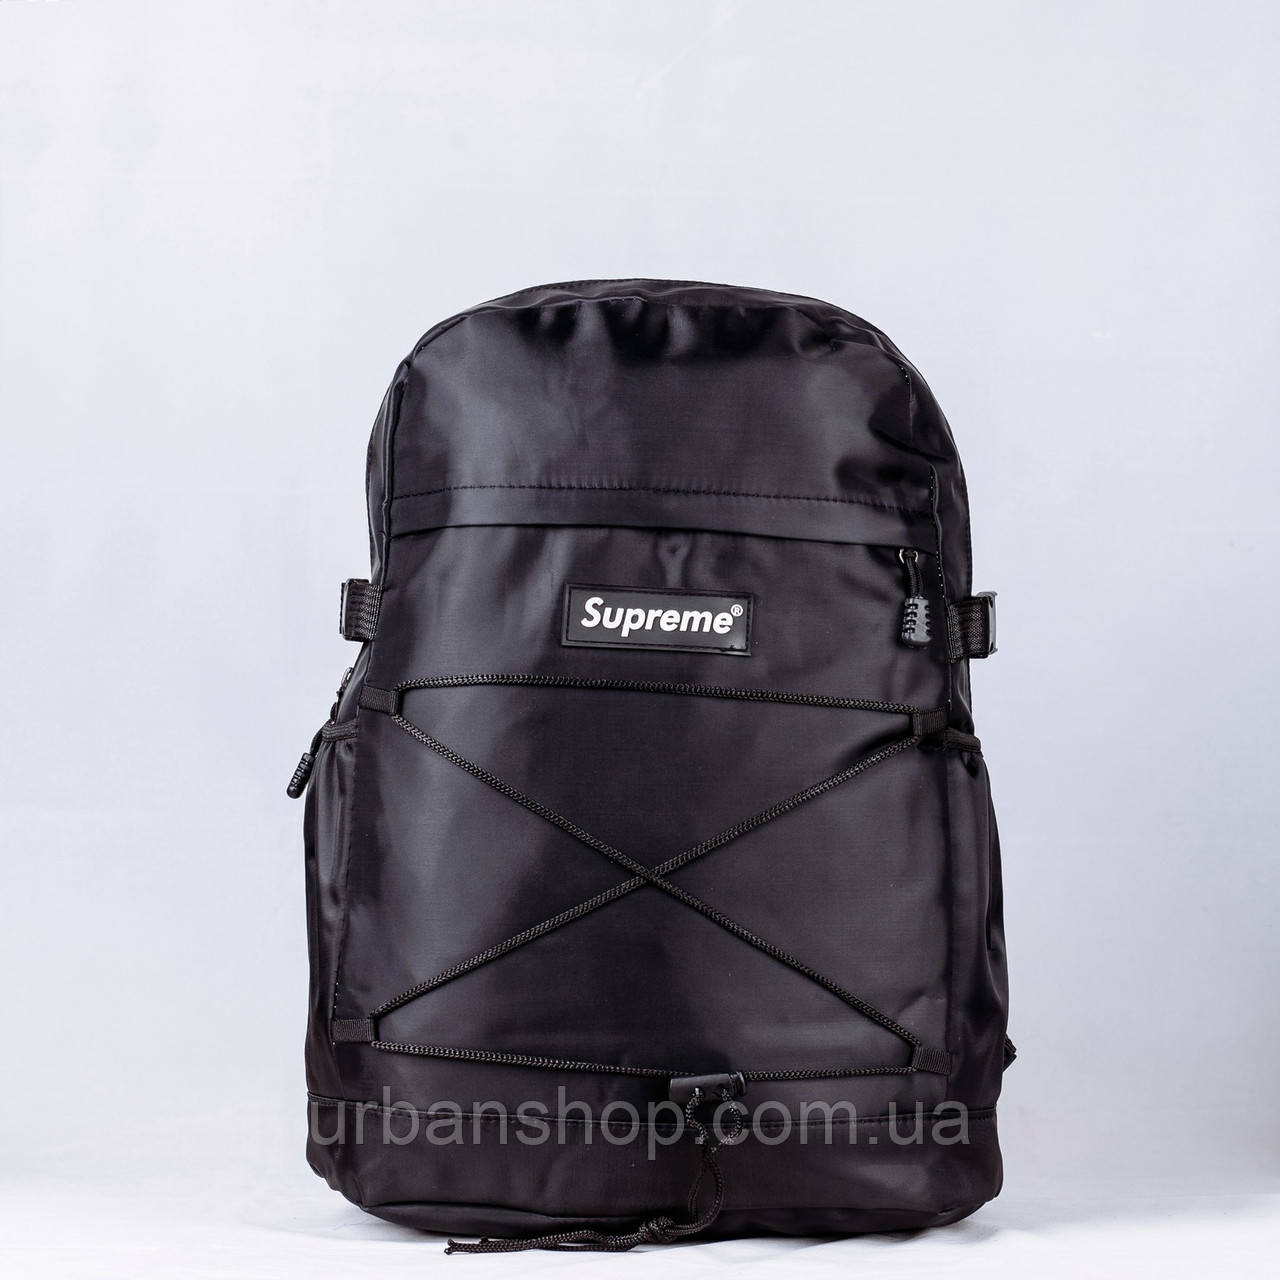 Рюкзак Supreme Рюкзак Supreme Black